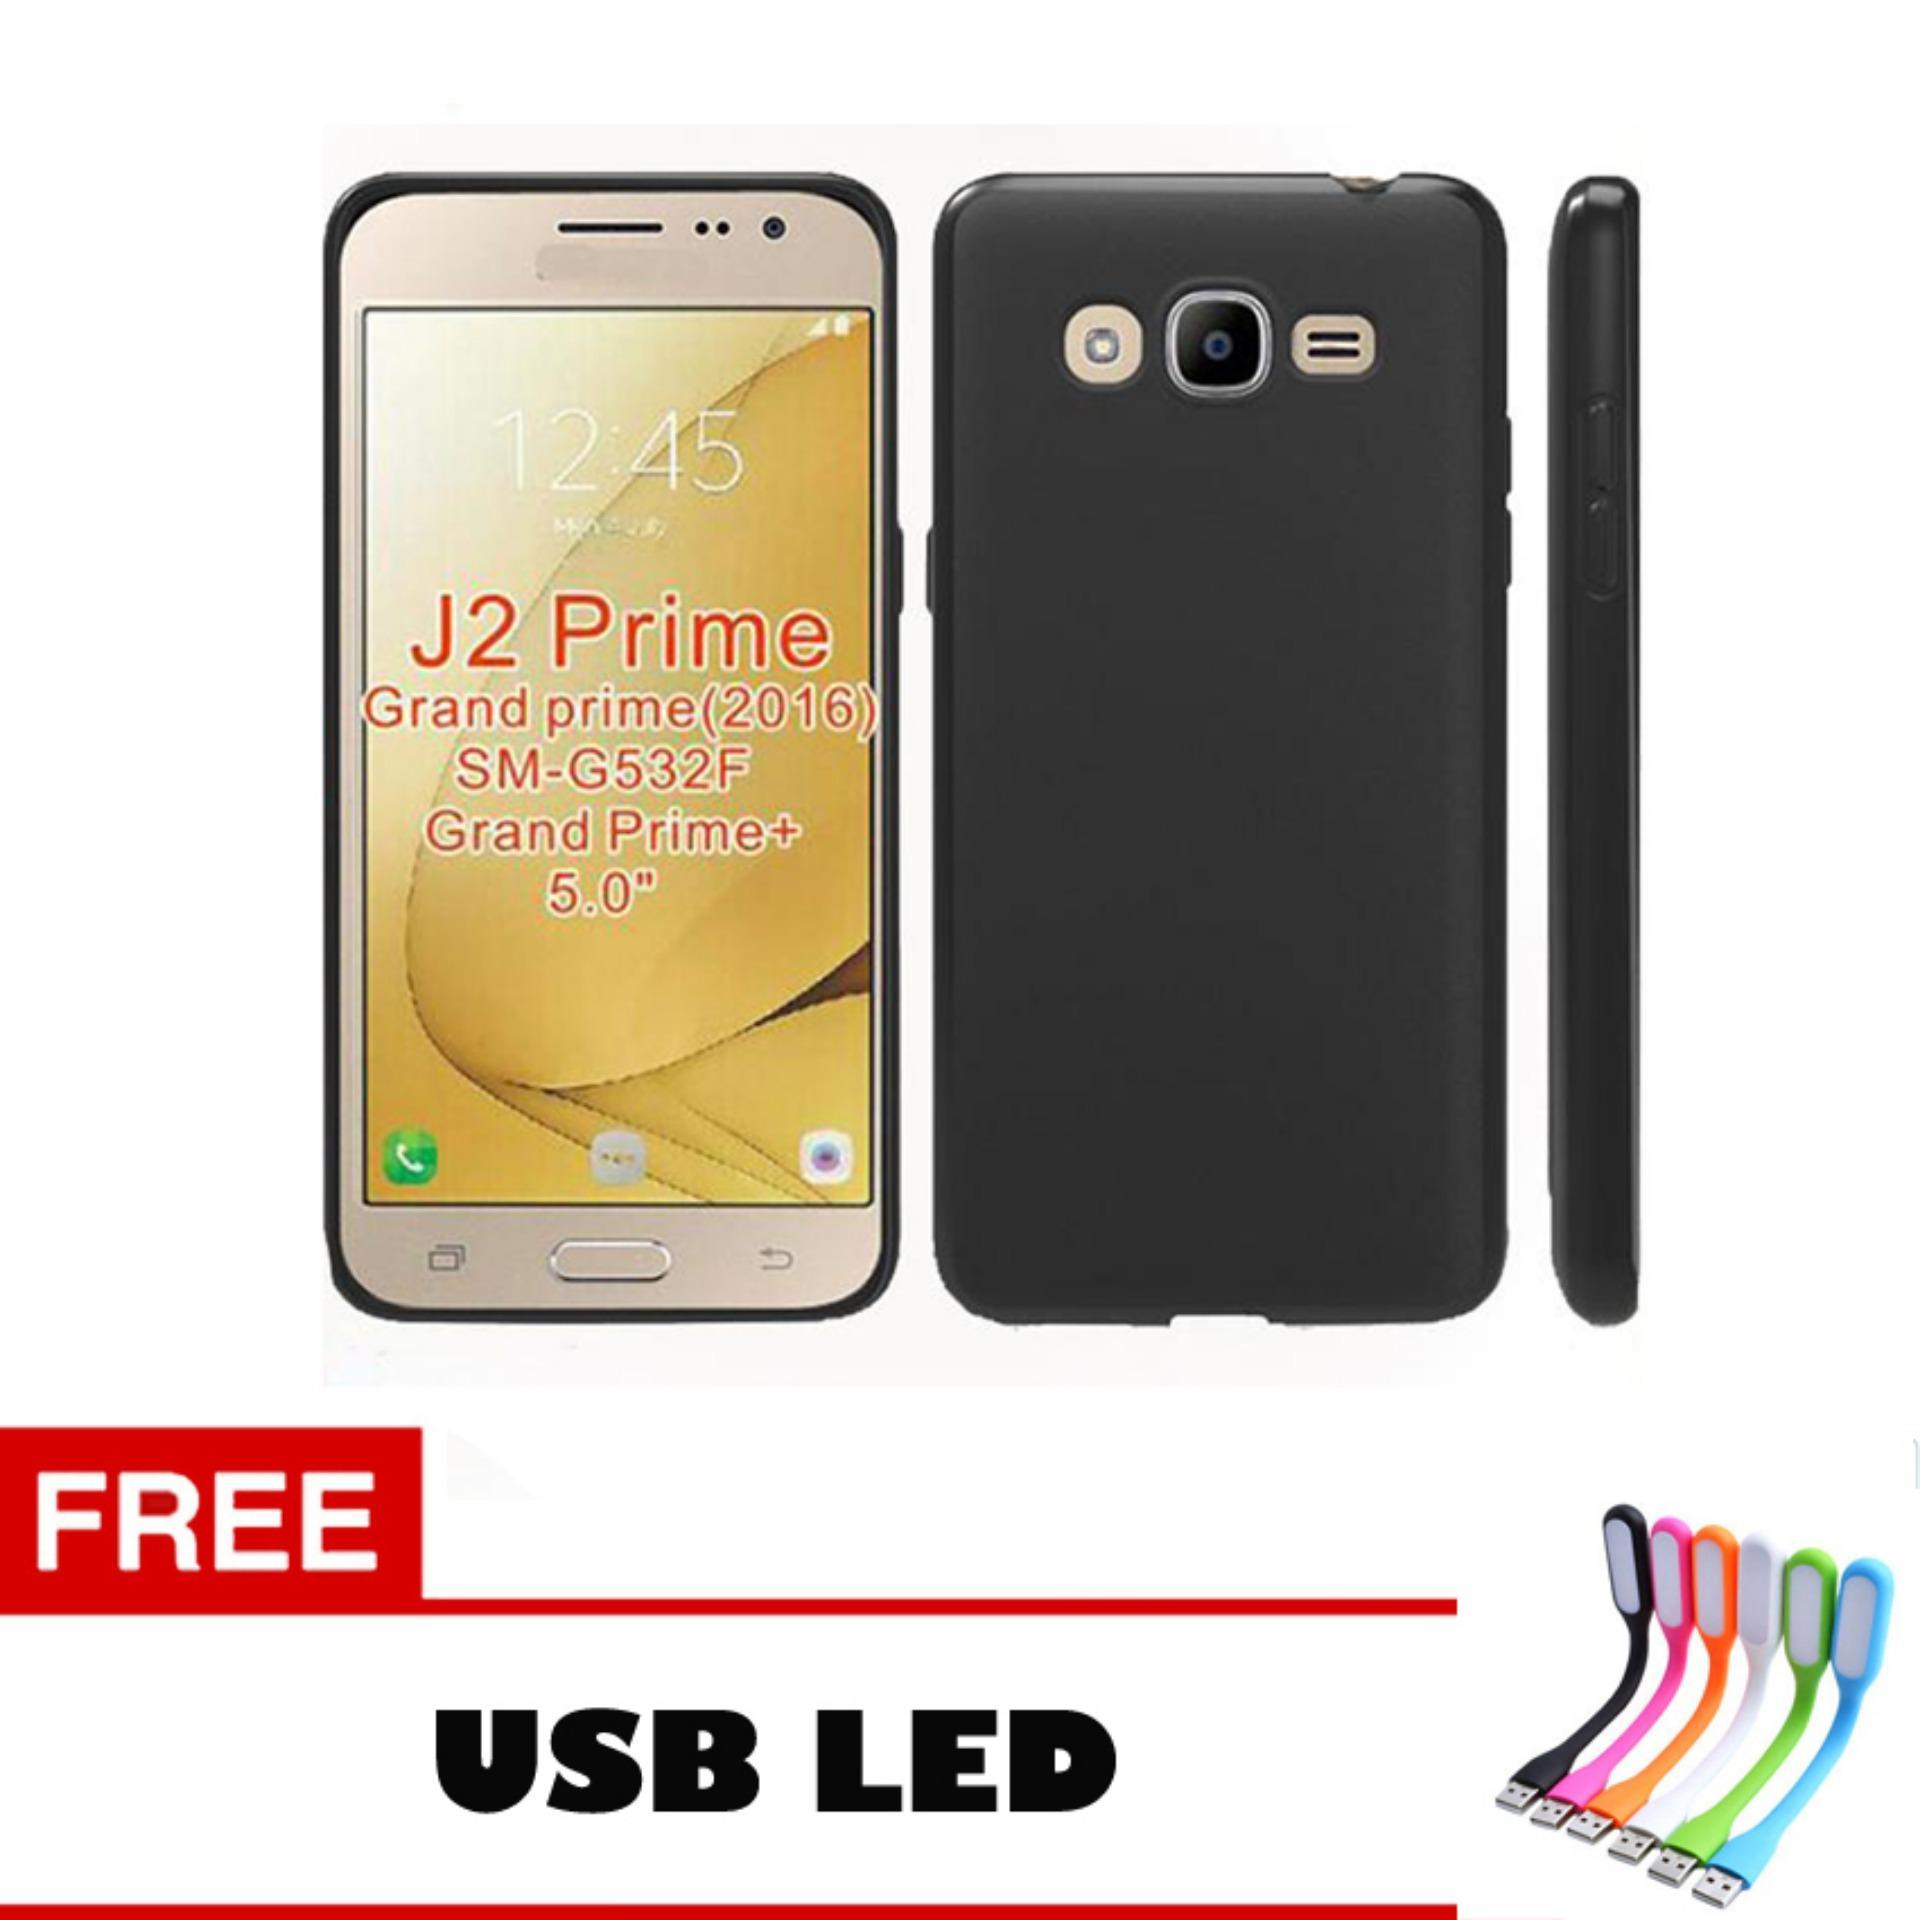 Case Anti Shock Crack Elegant Softcase For Samsung Galaxy J2 Ace4 Lte Free Memory Card 8gb Clearance  Hitam Slim Black Matte Prime Baby Skin Usb Led